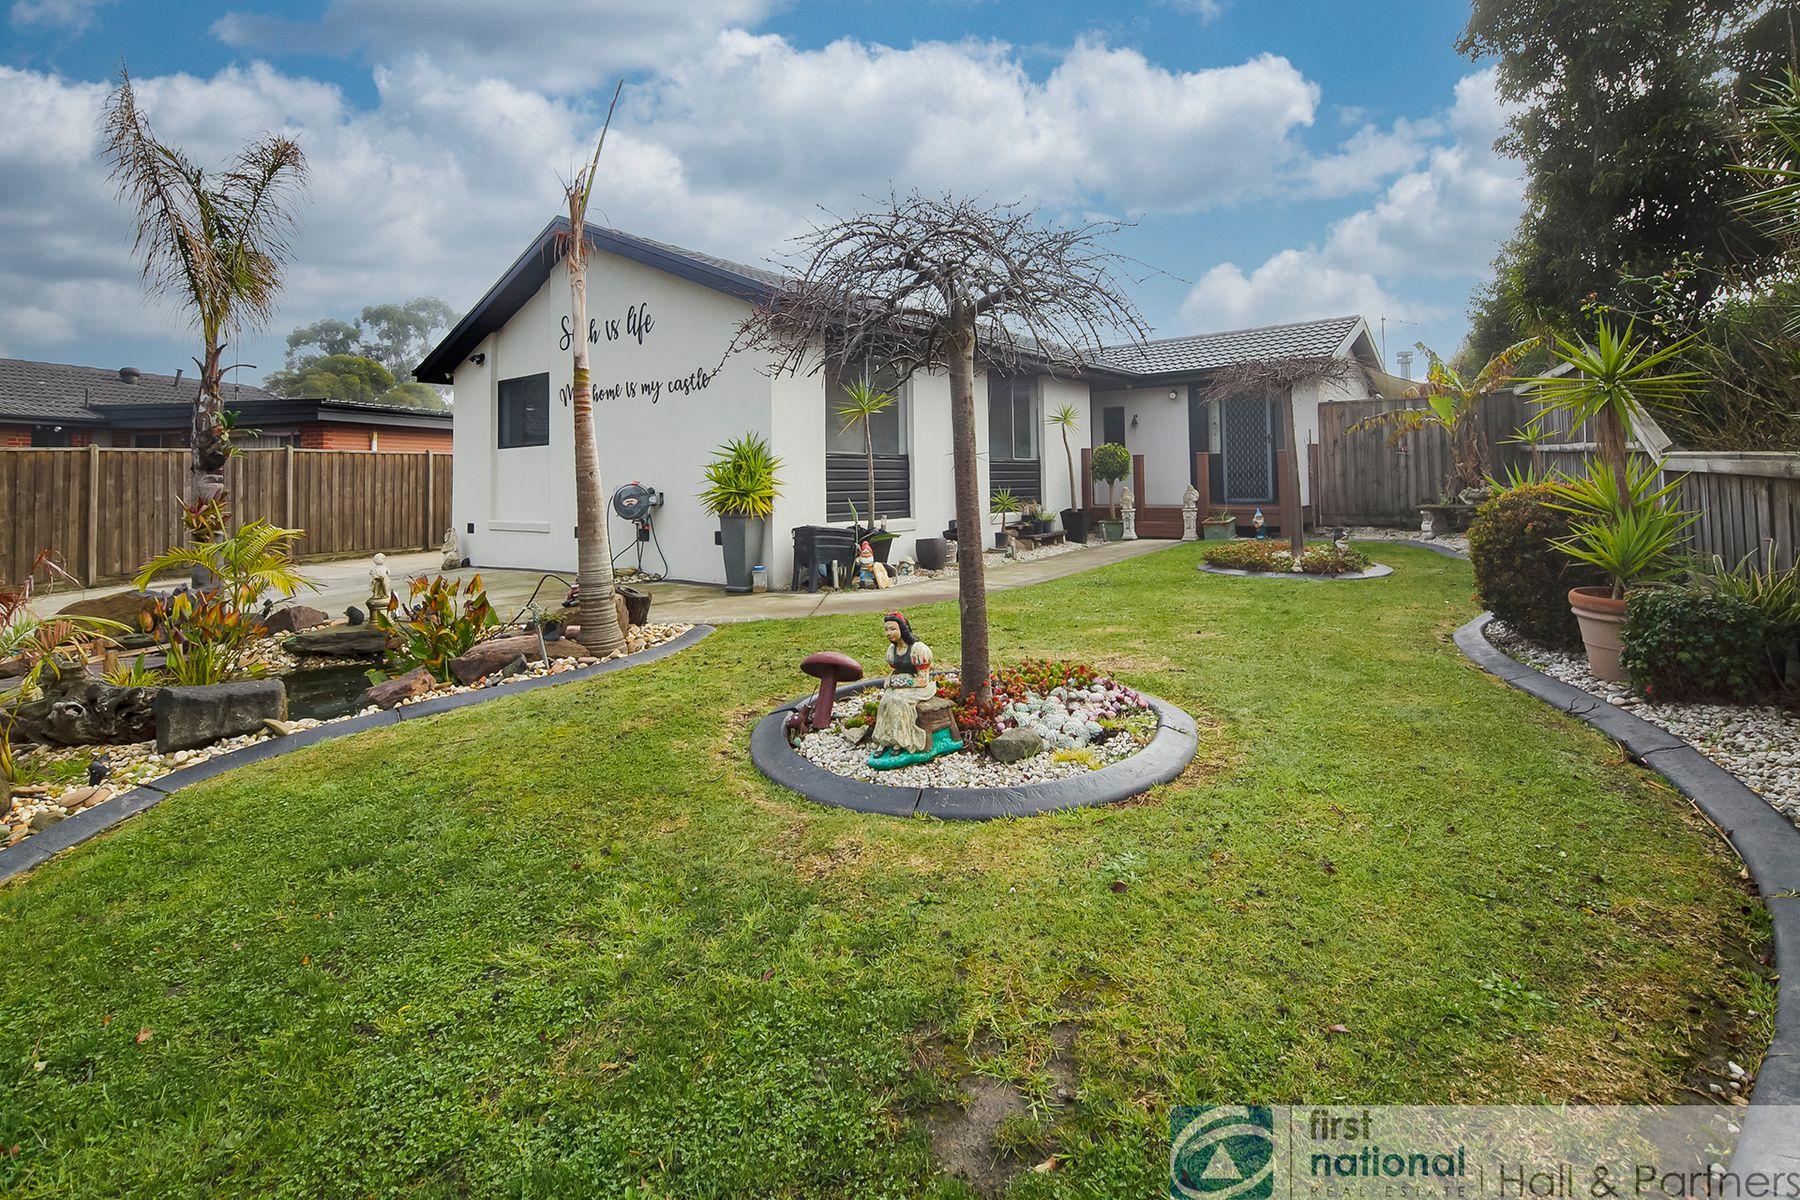 2 Nadia Court, Endeavour Hills, VIC 3802